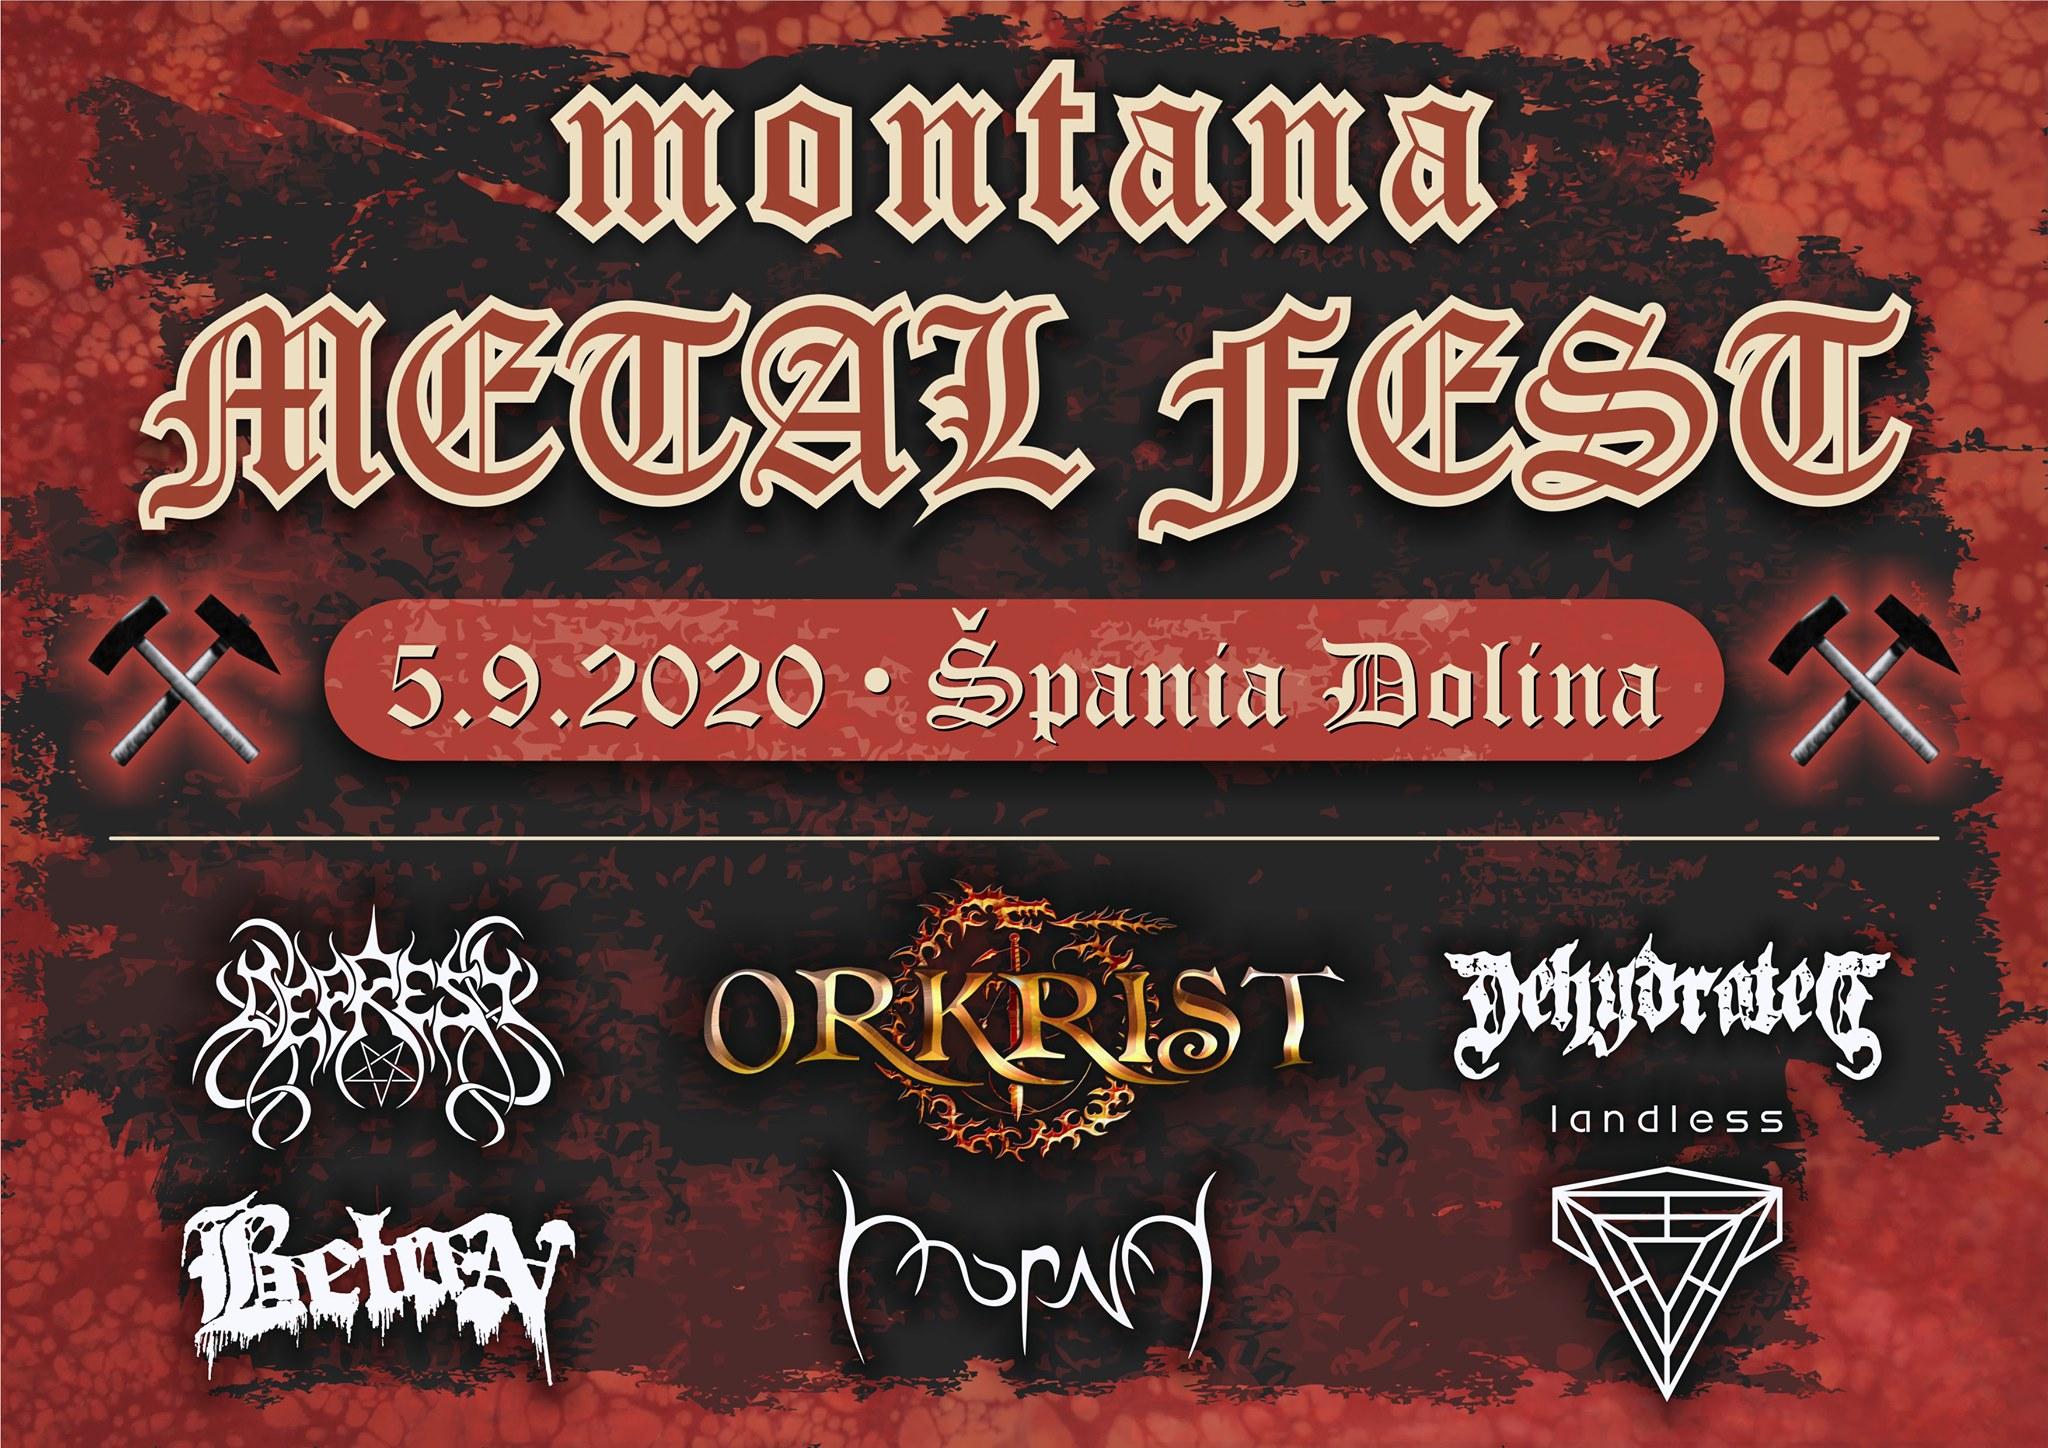 Montana Metal Fest